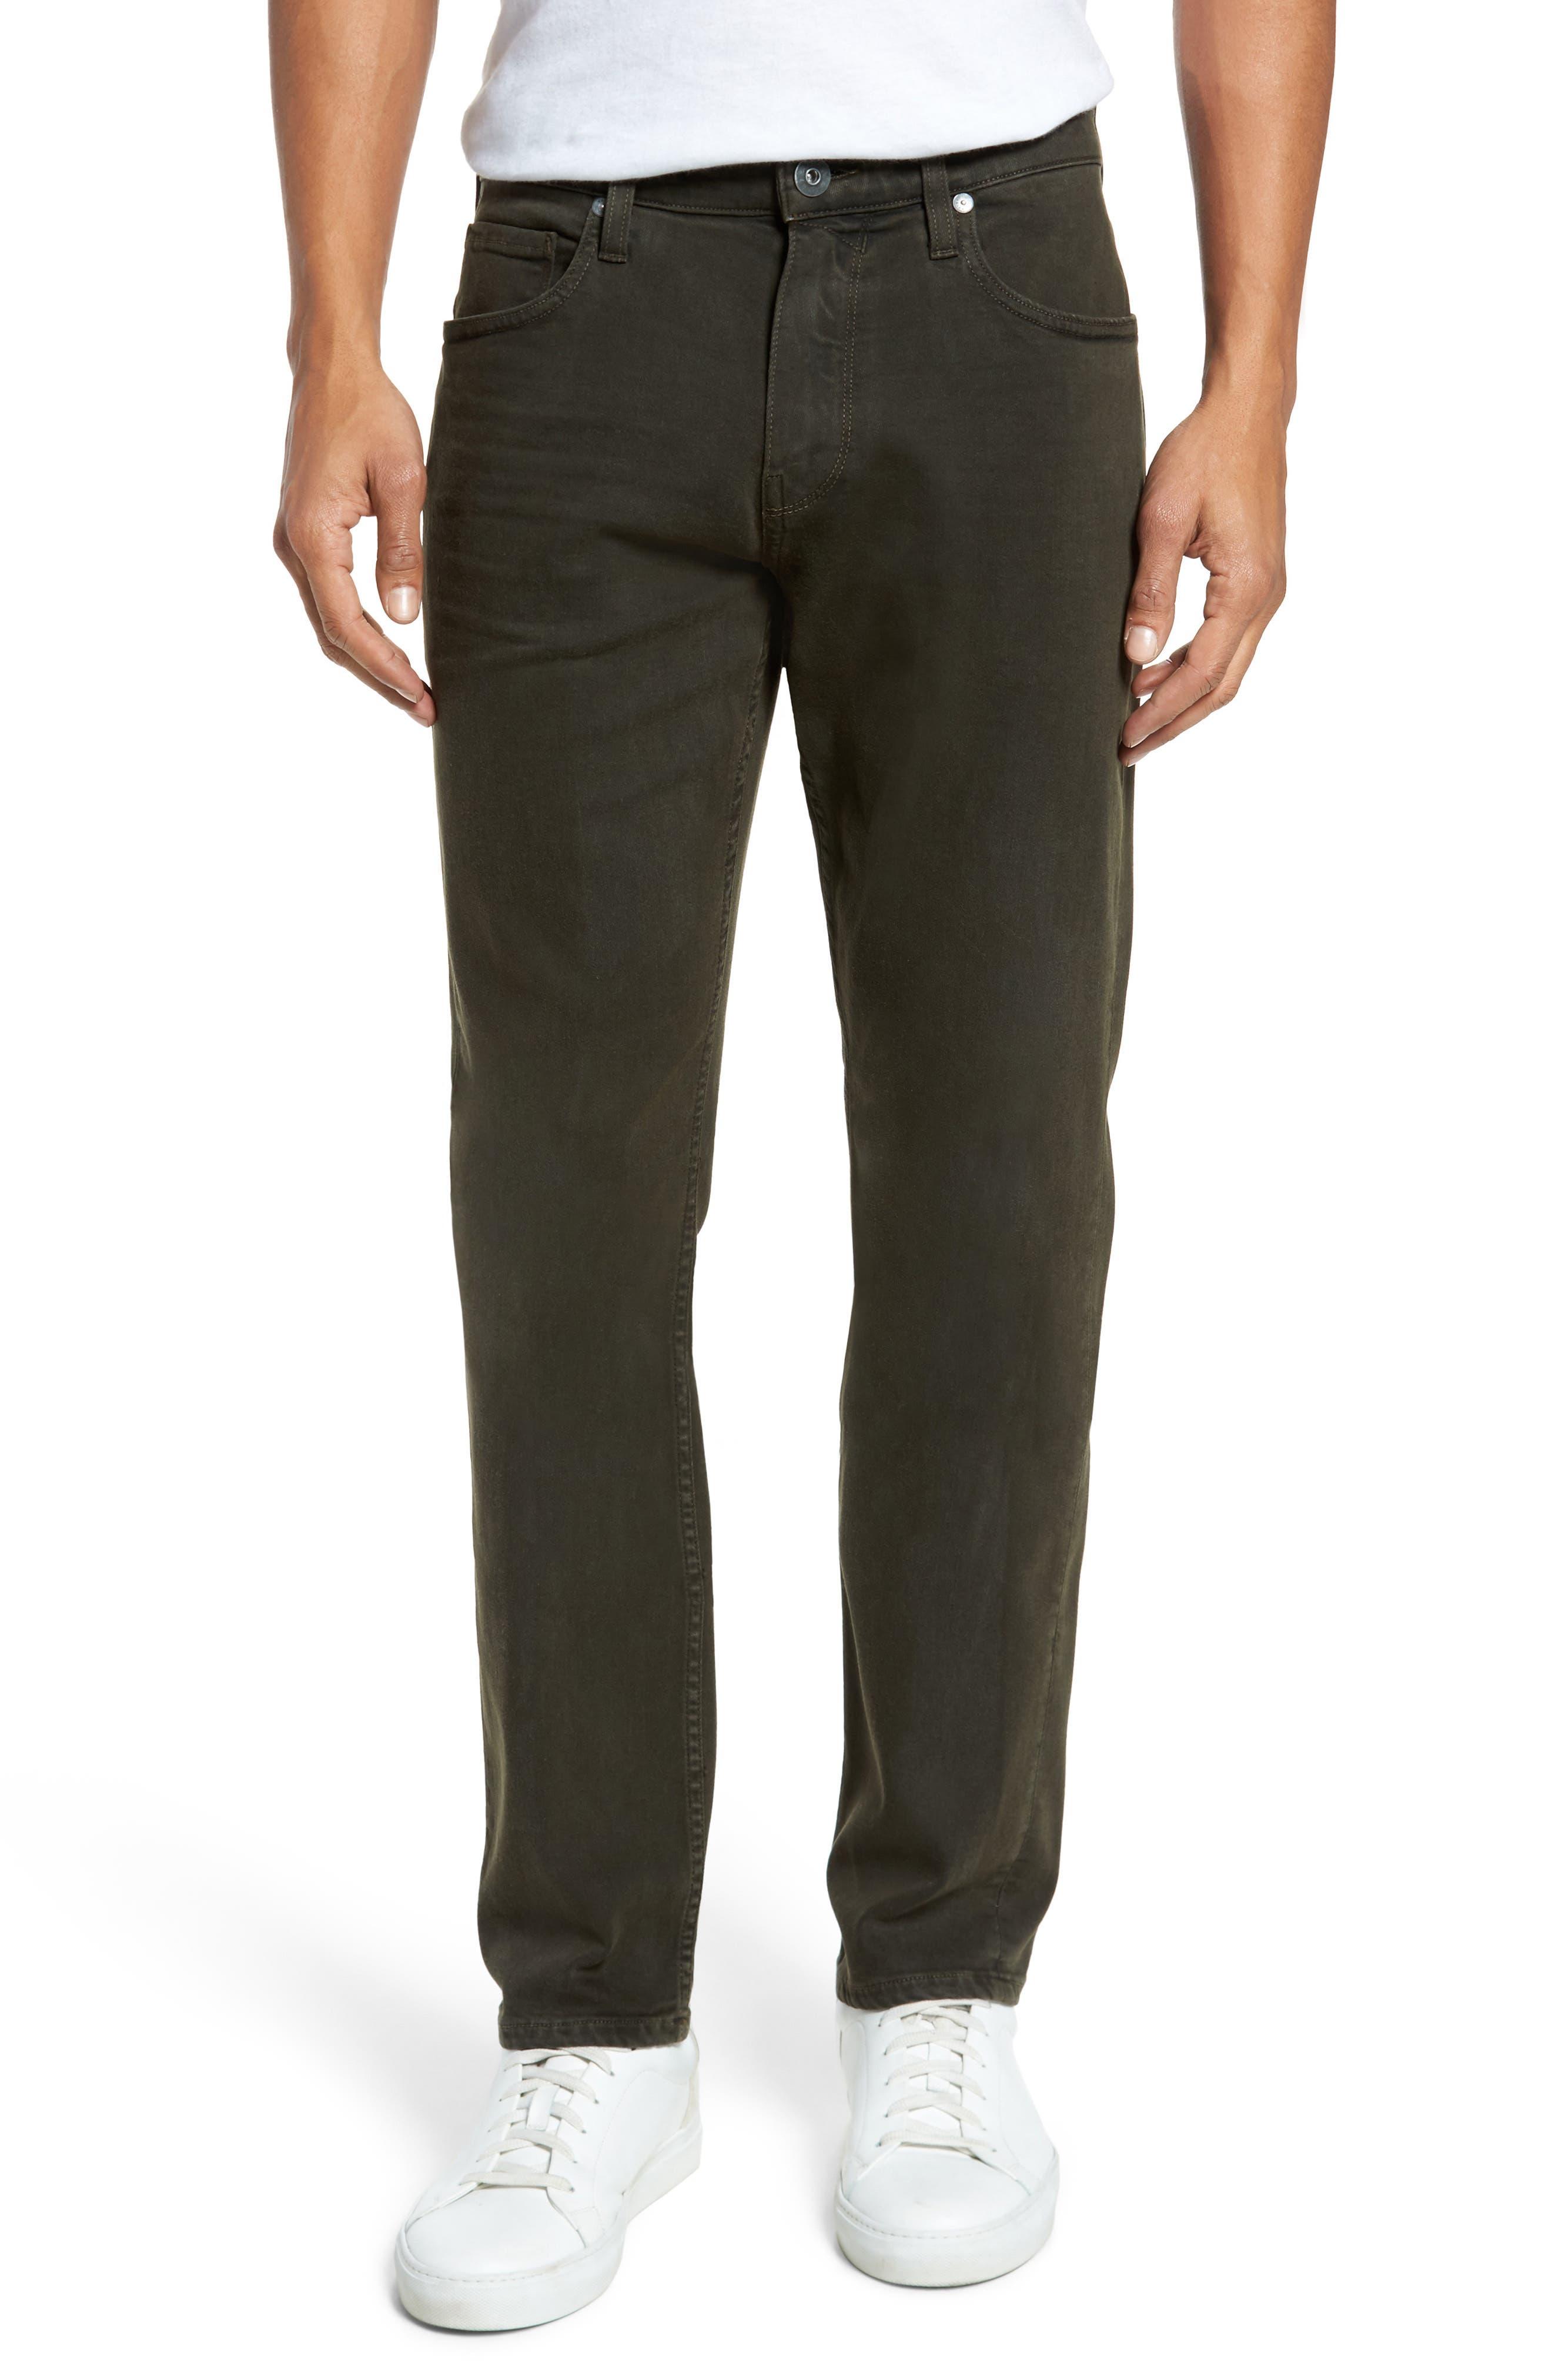 Transcend - Federal Slim Straight Leg Jeans,                         Main,                         color, 001